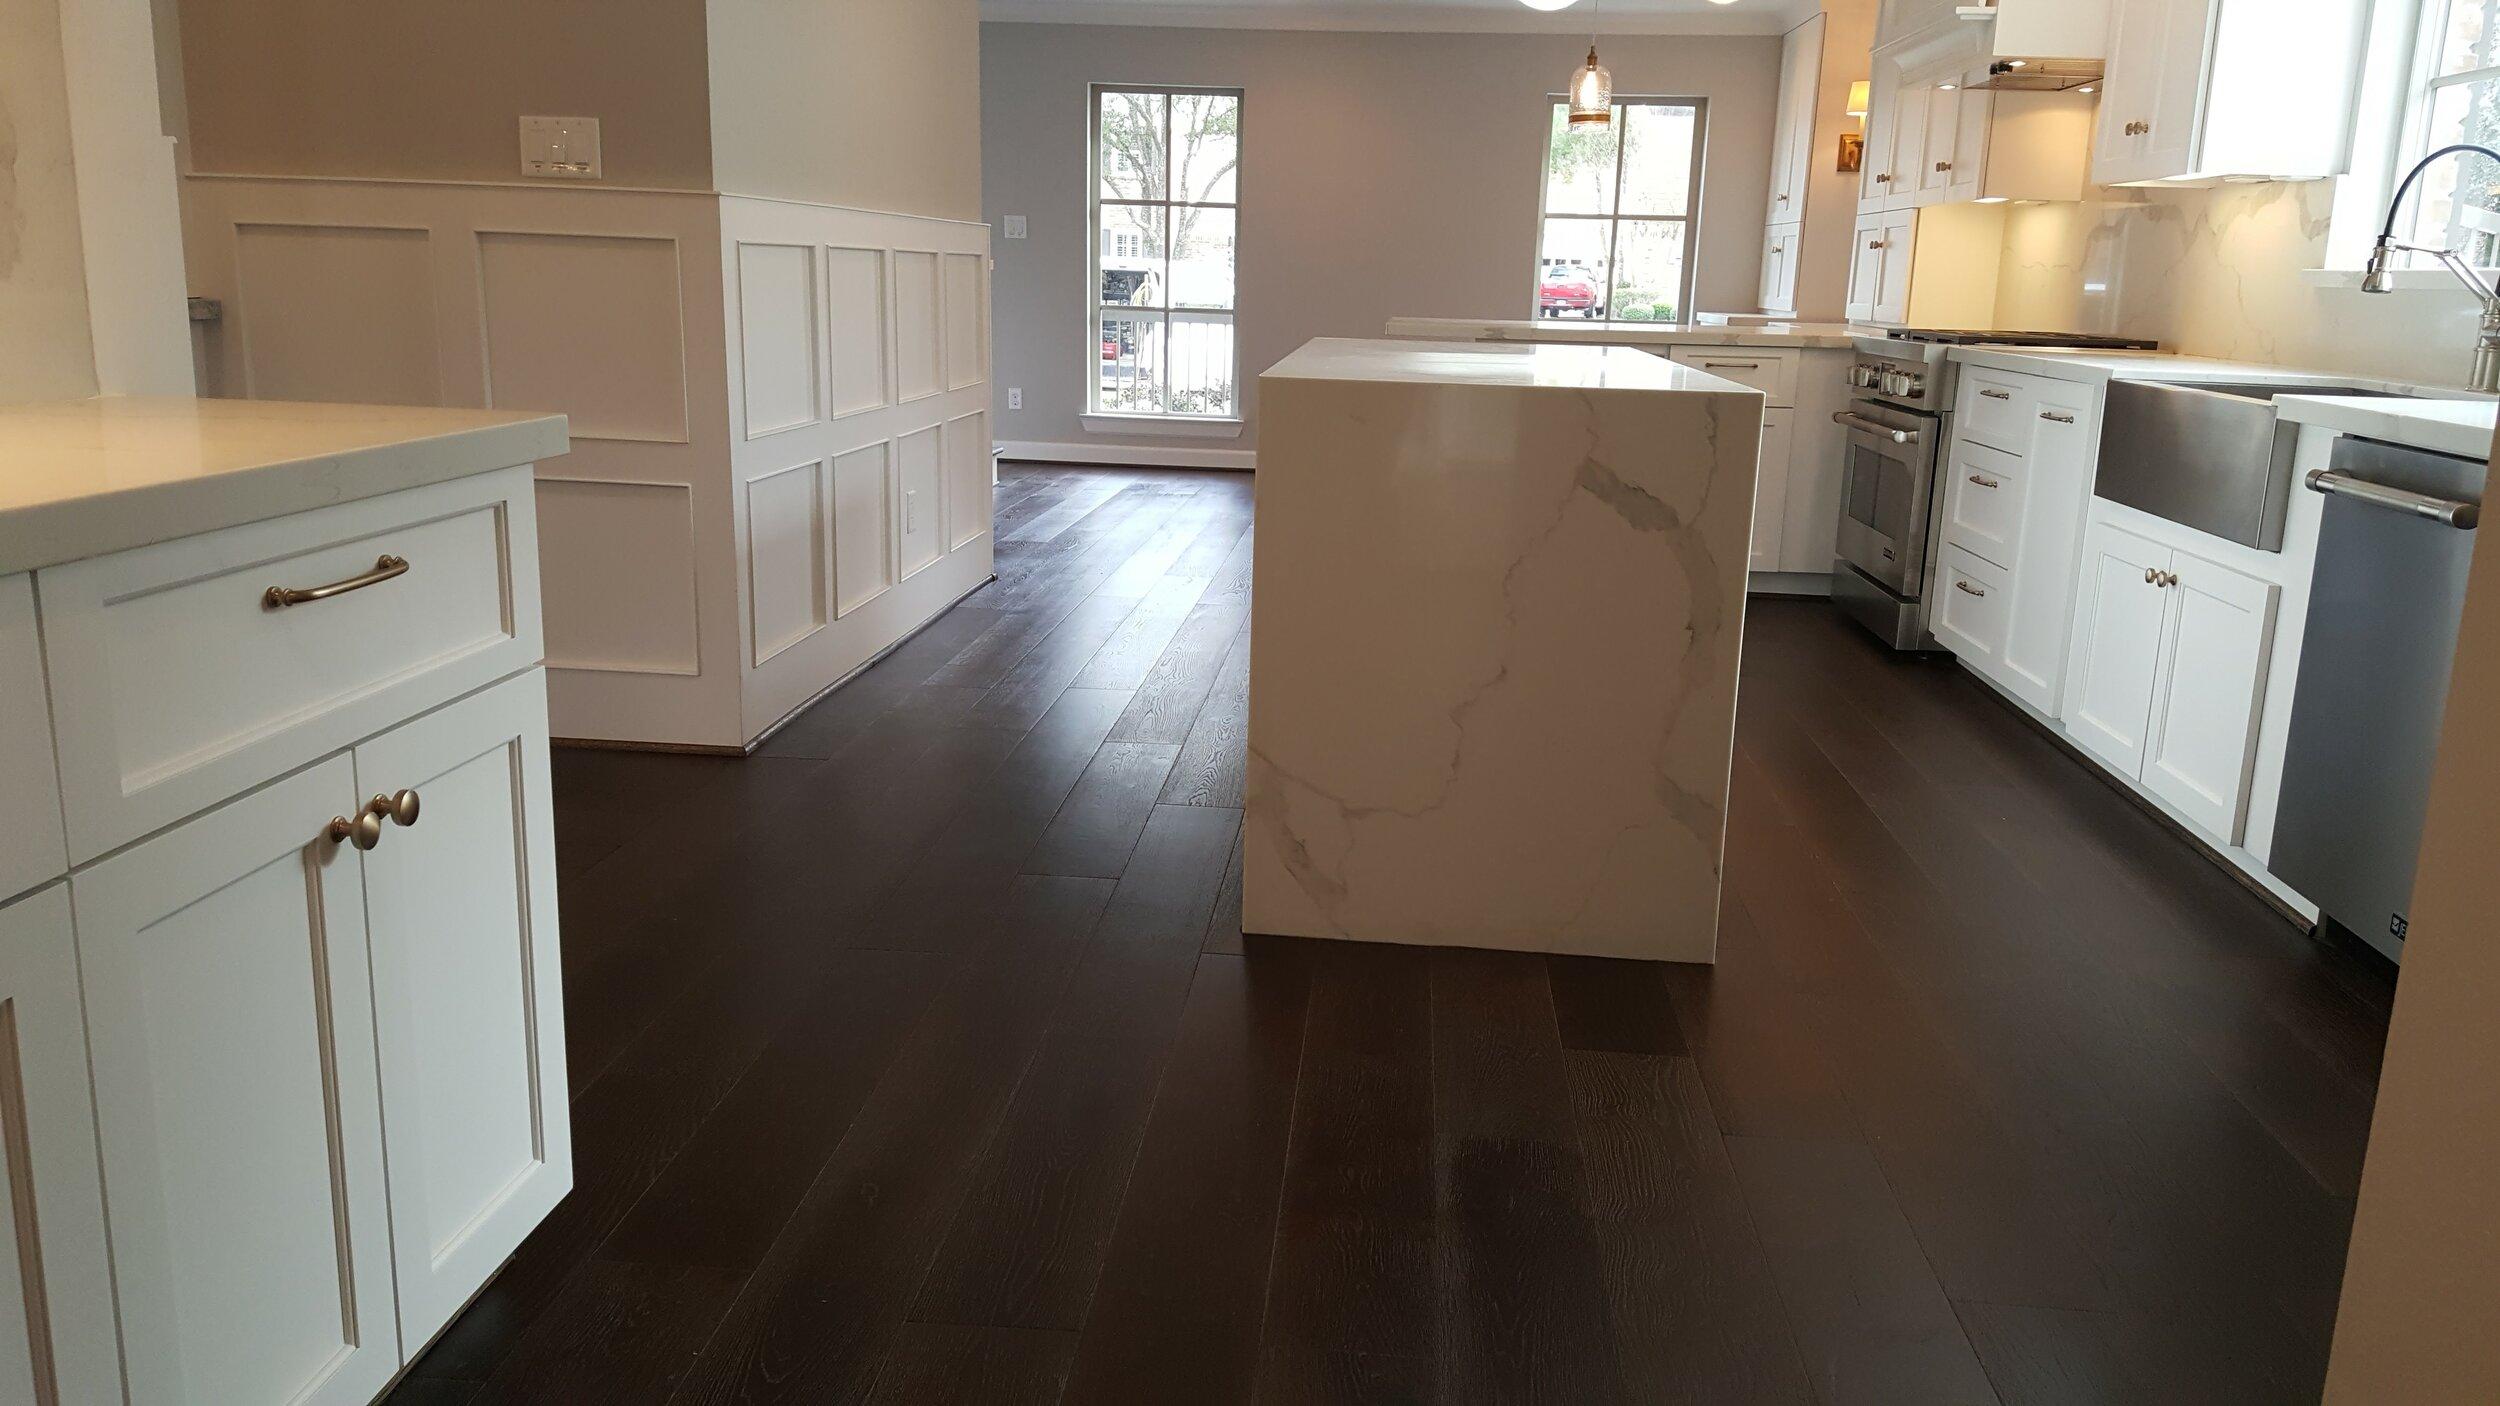 Houston Hardwood Floor Refinishing-Installations-HOUSTON, WOOD FLOOR,  REFINISHING, INSTALLERS, CONTRACTORS, HOUSTON, KATY, CINCO RANCH, RICHMOND,  SUGAR LAND, WEST UNIVERSITY, BELLAIRE, PINEY POINT VILLAGE, RIVER OAKS,  MEMORIAL, TANGLEWOOD SUBDIVISION ...